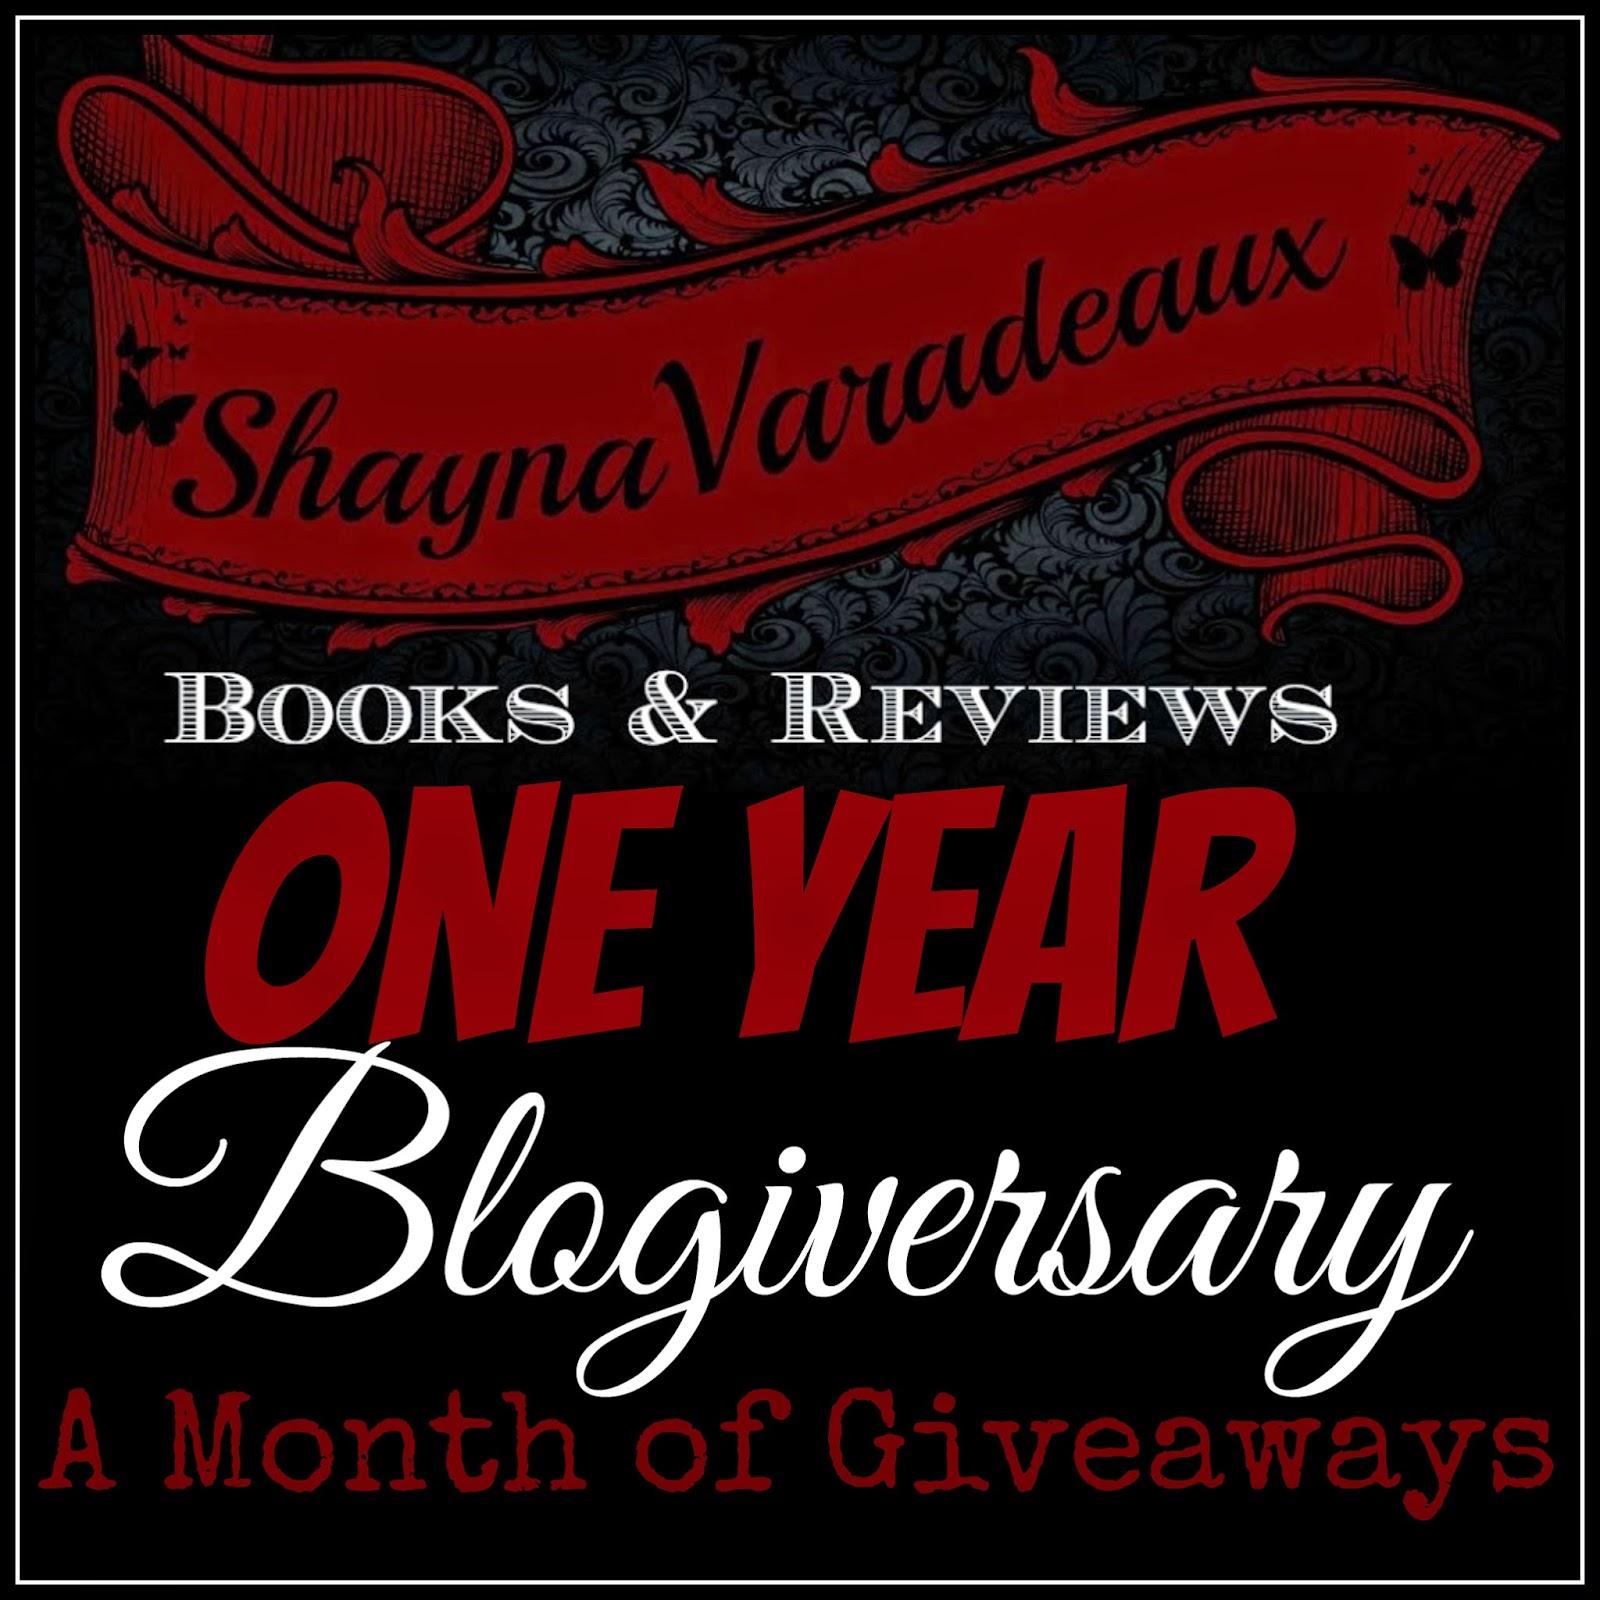 http://www.shaynavaradeauxbooks.blogspot.com